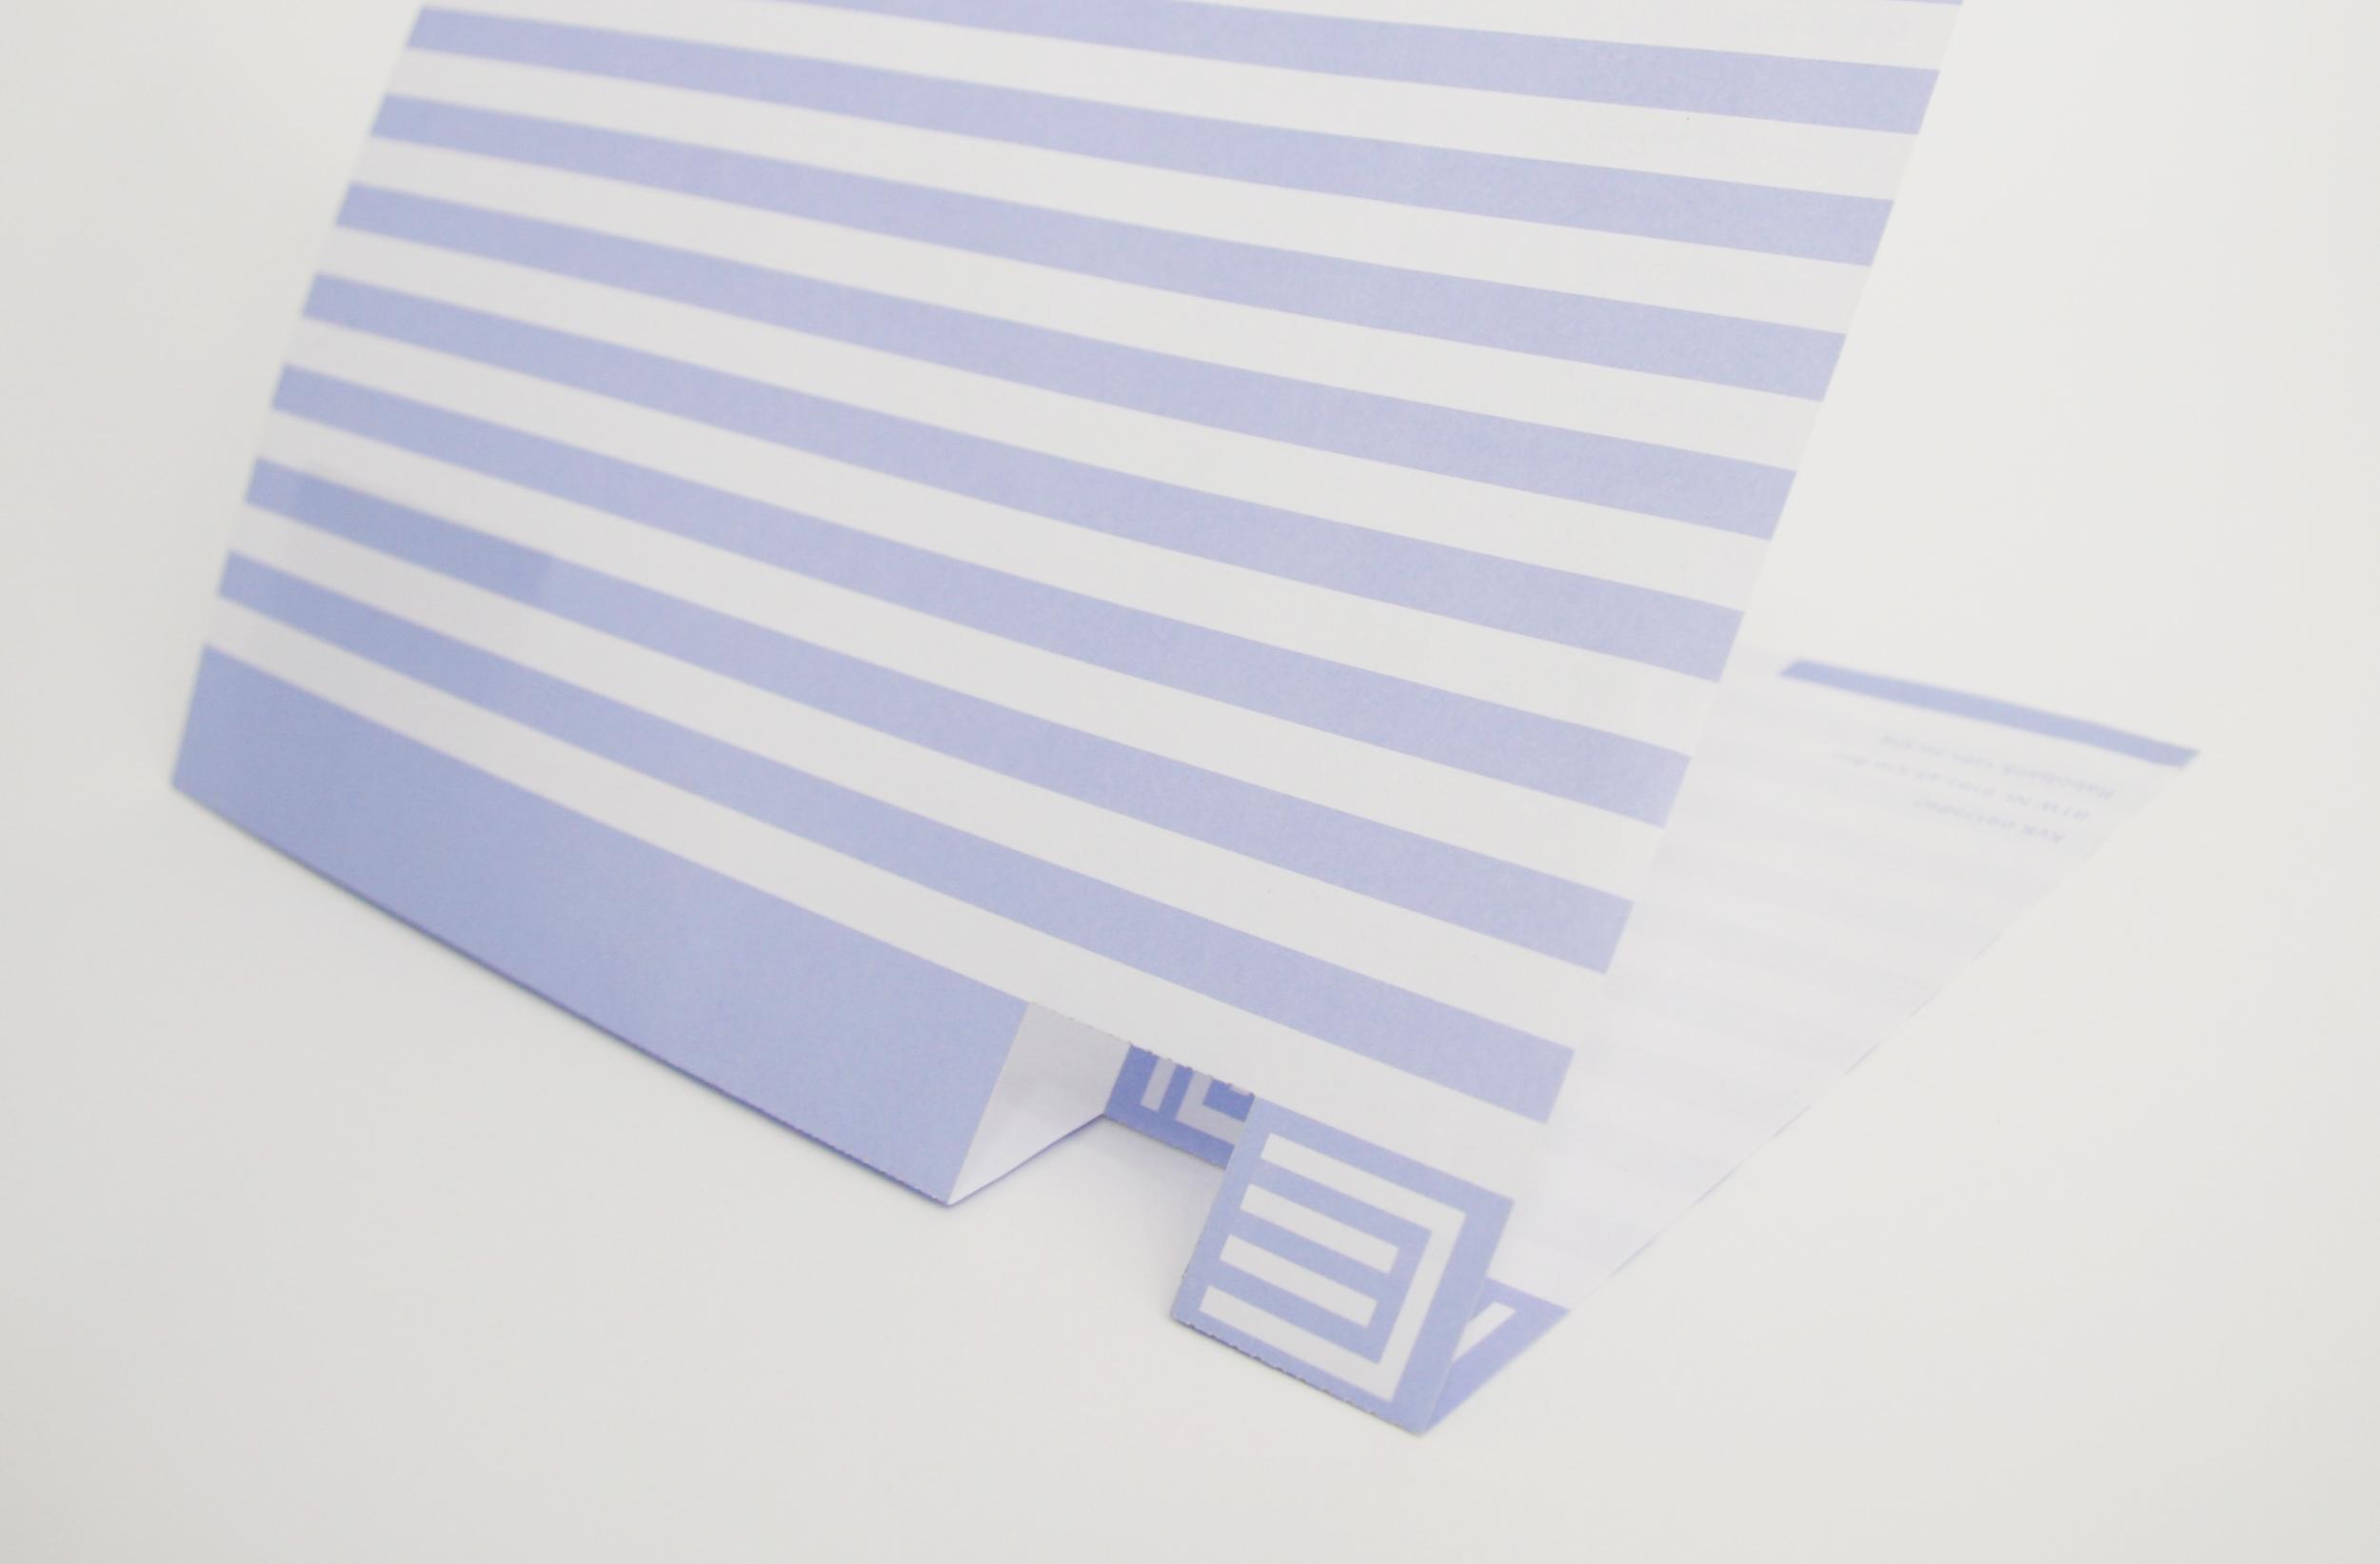 M2M3 ankeiler briefpapier